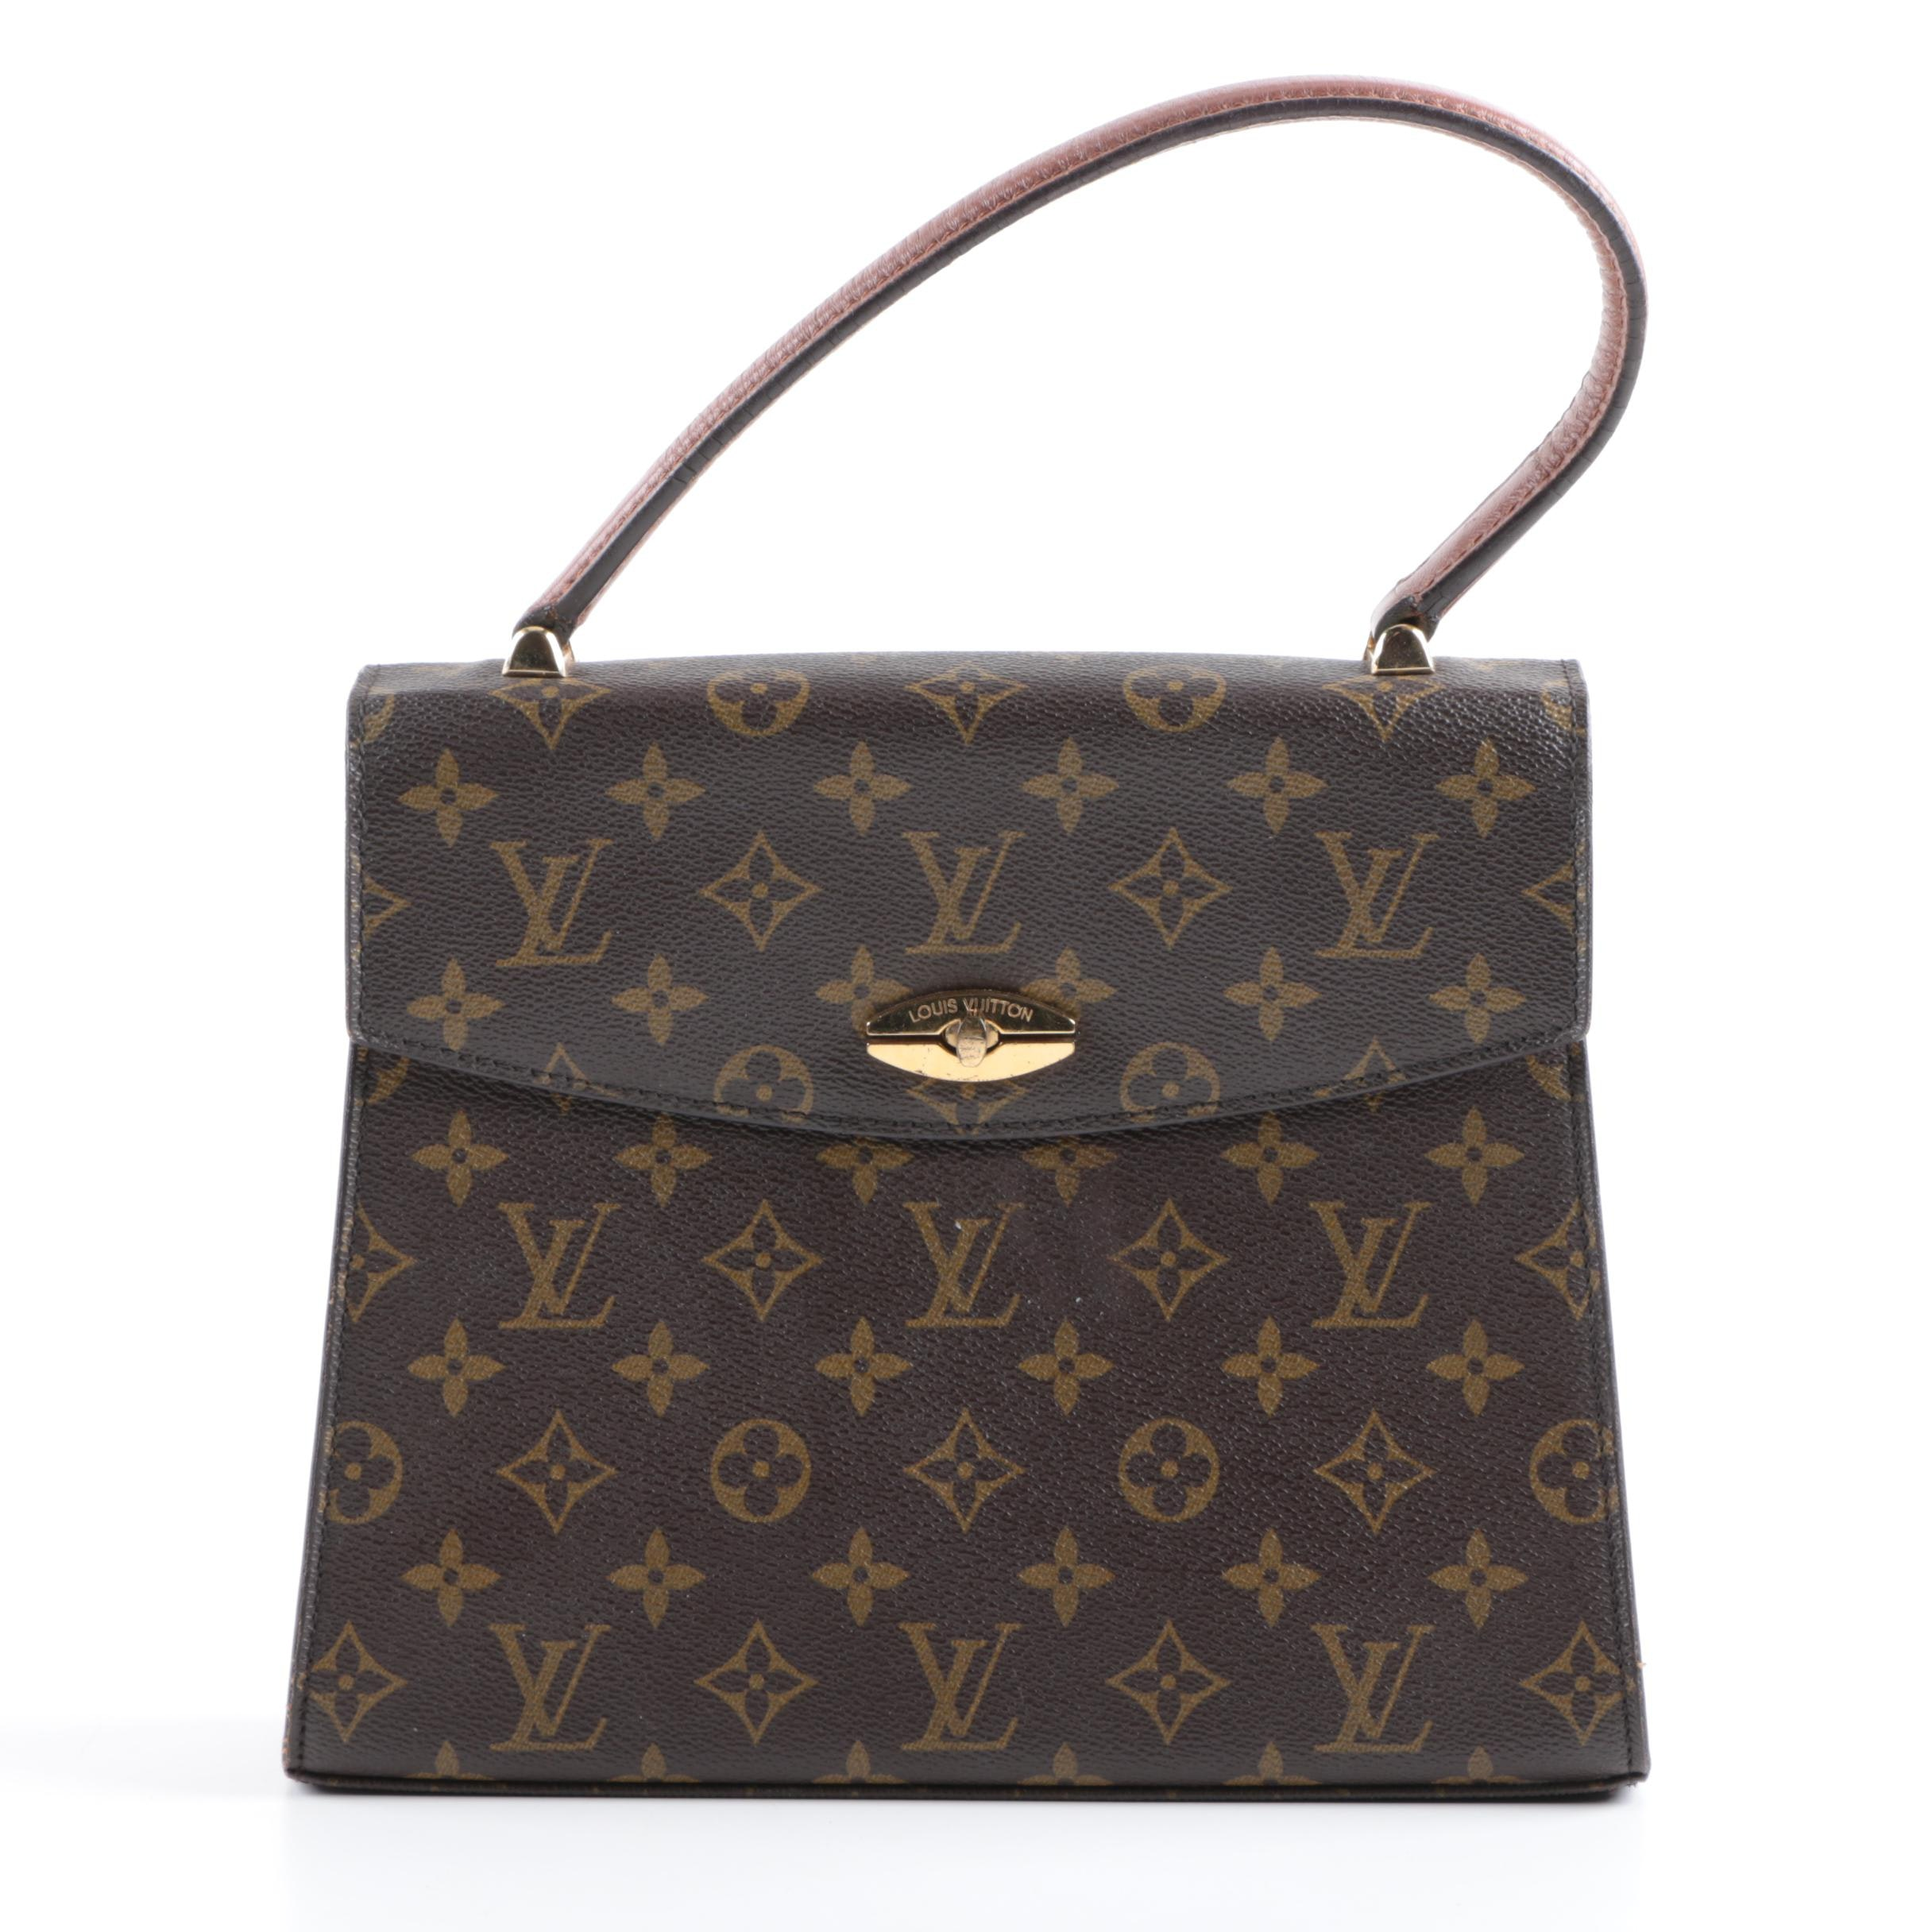 1991 Louis Vuitton Malesherbes Monogrammed Canvas Handbag